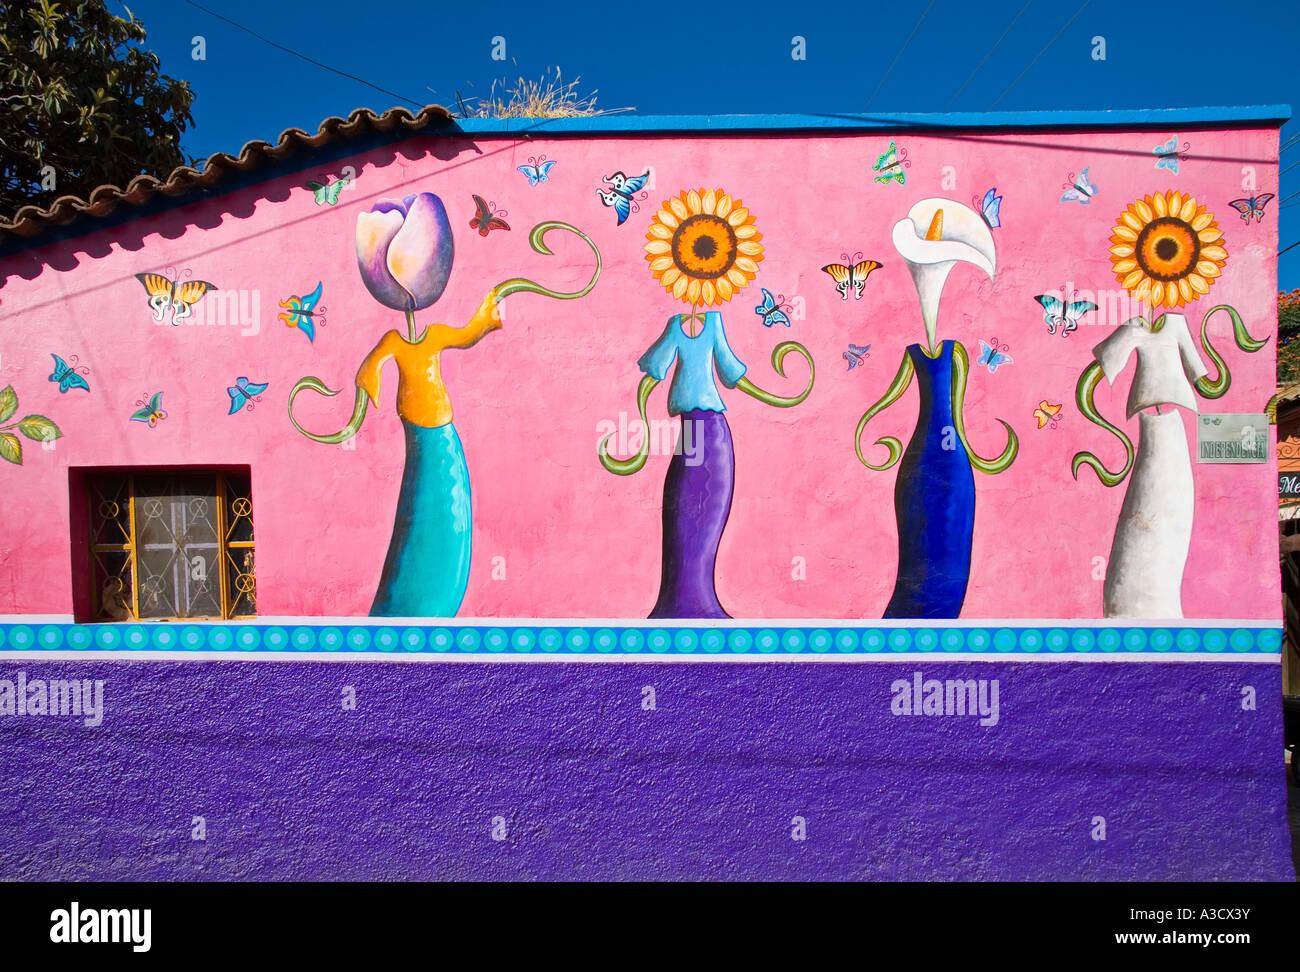 Dress Shop Mural - Stock Image